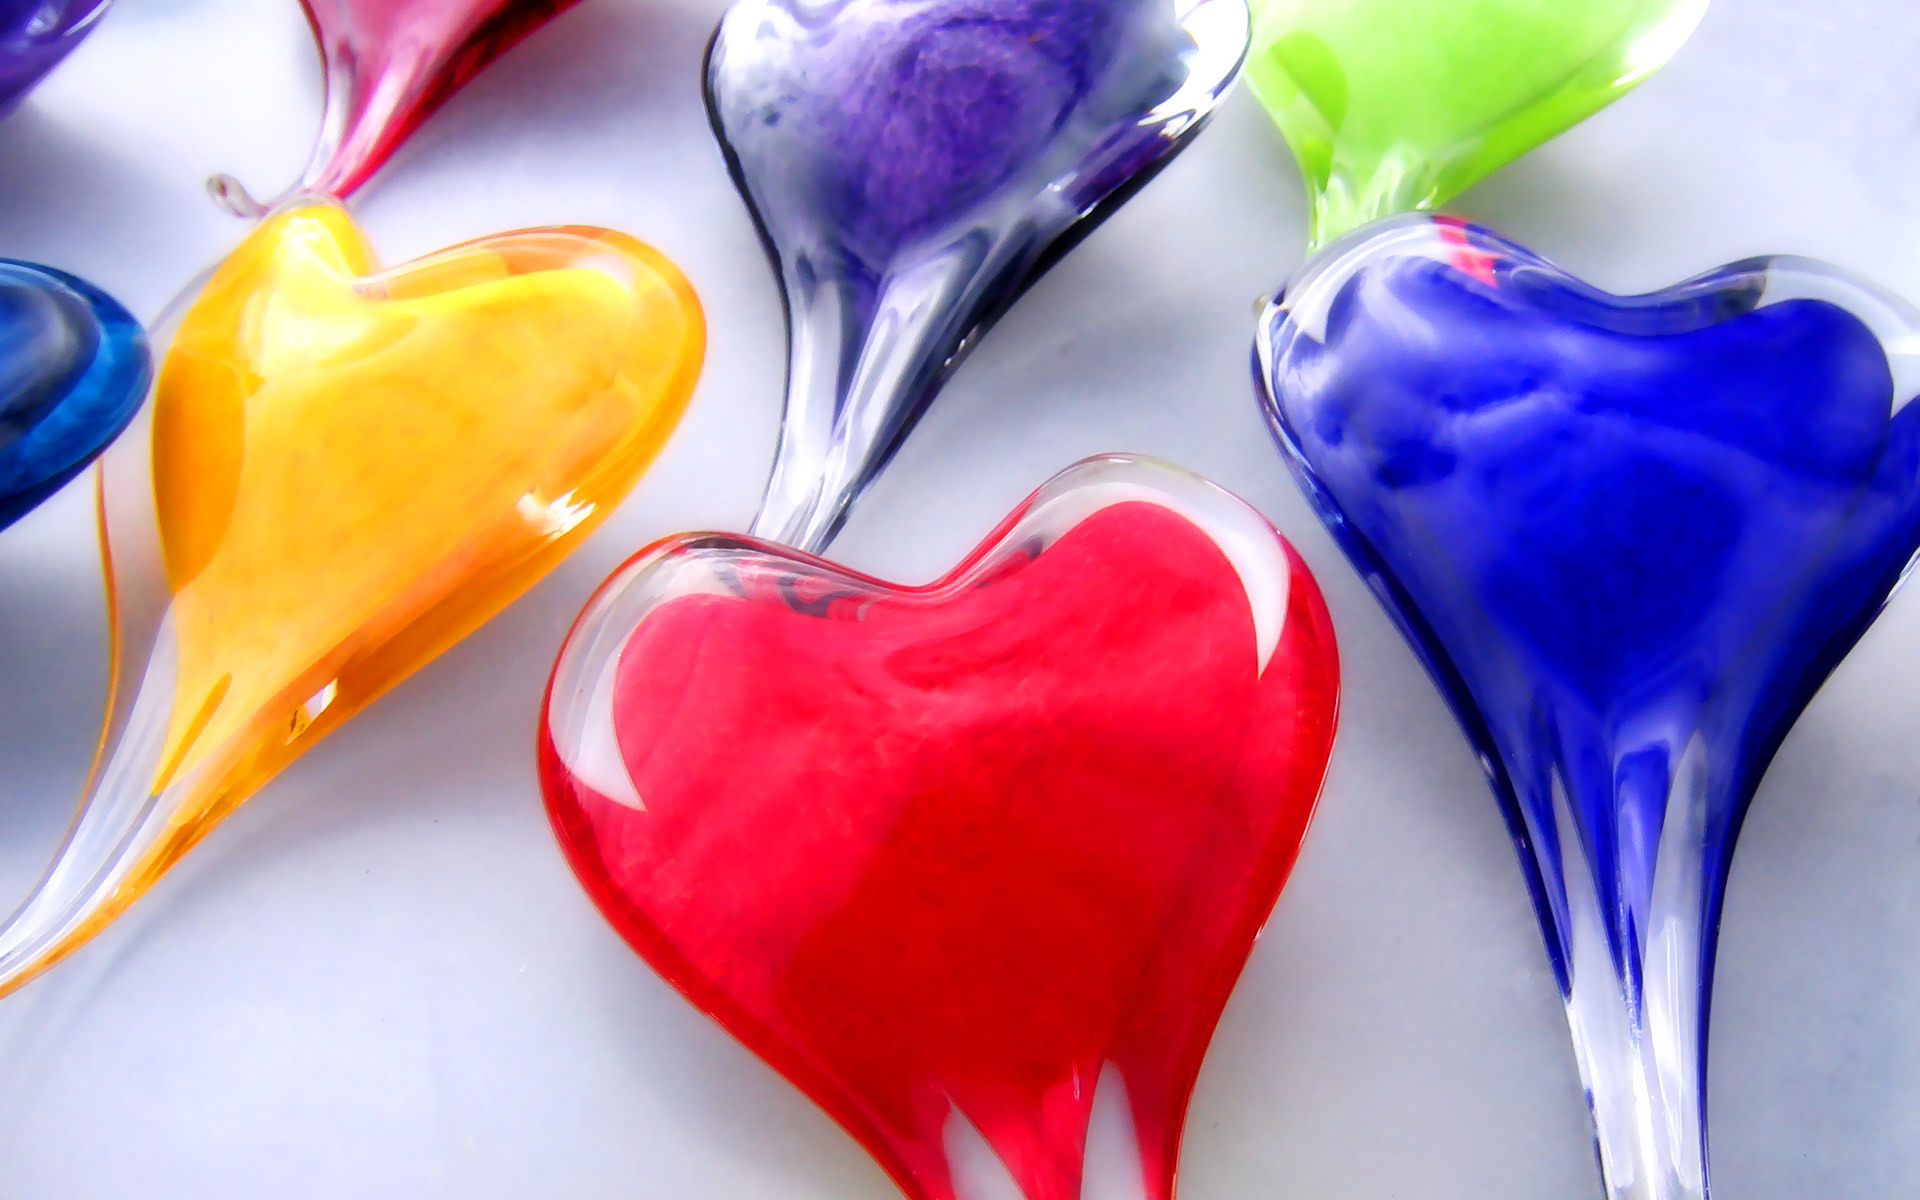 Imagenes Fondo De Escritorio 3d: Love Wallpapers Hd, Amor Fondos De Pantalla, Love 3D